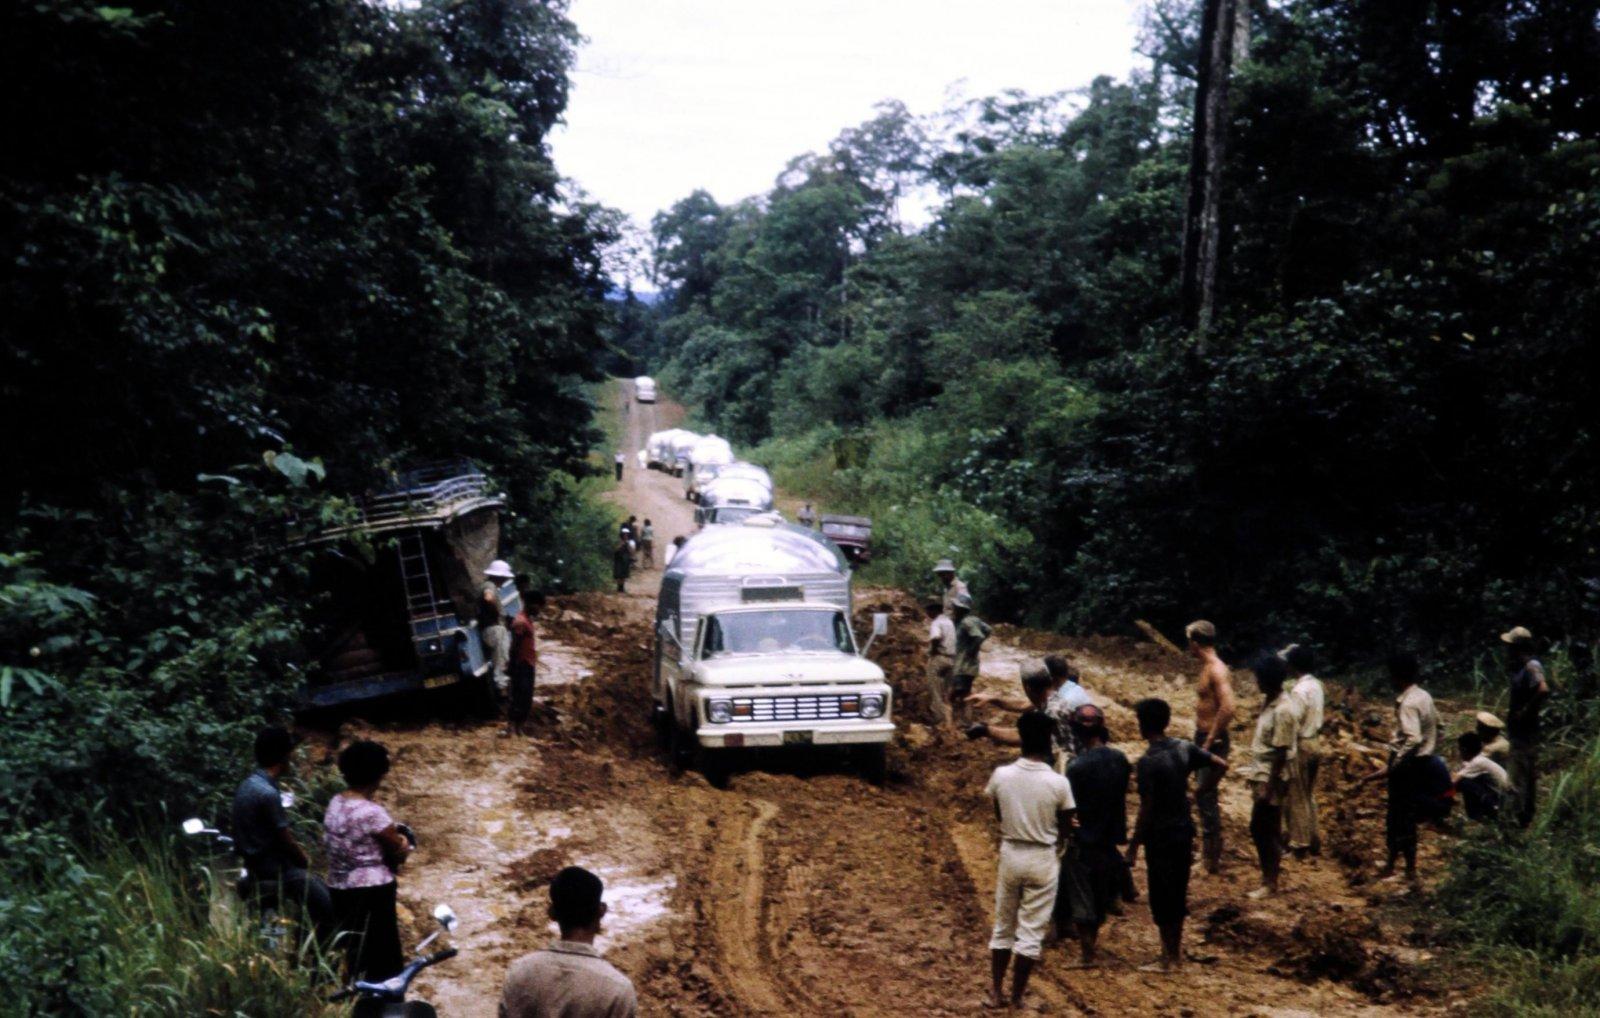 Click image for larger version  Name:Road Trip - Kra Peninsula, Thailand.jpg Views:61 Size:263.9 KB ID:302567